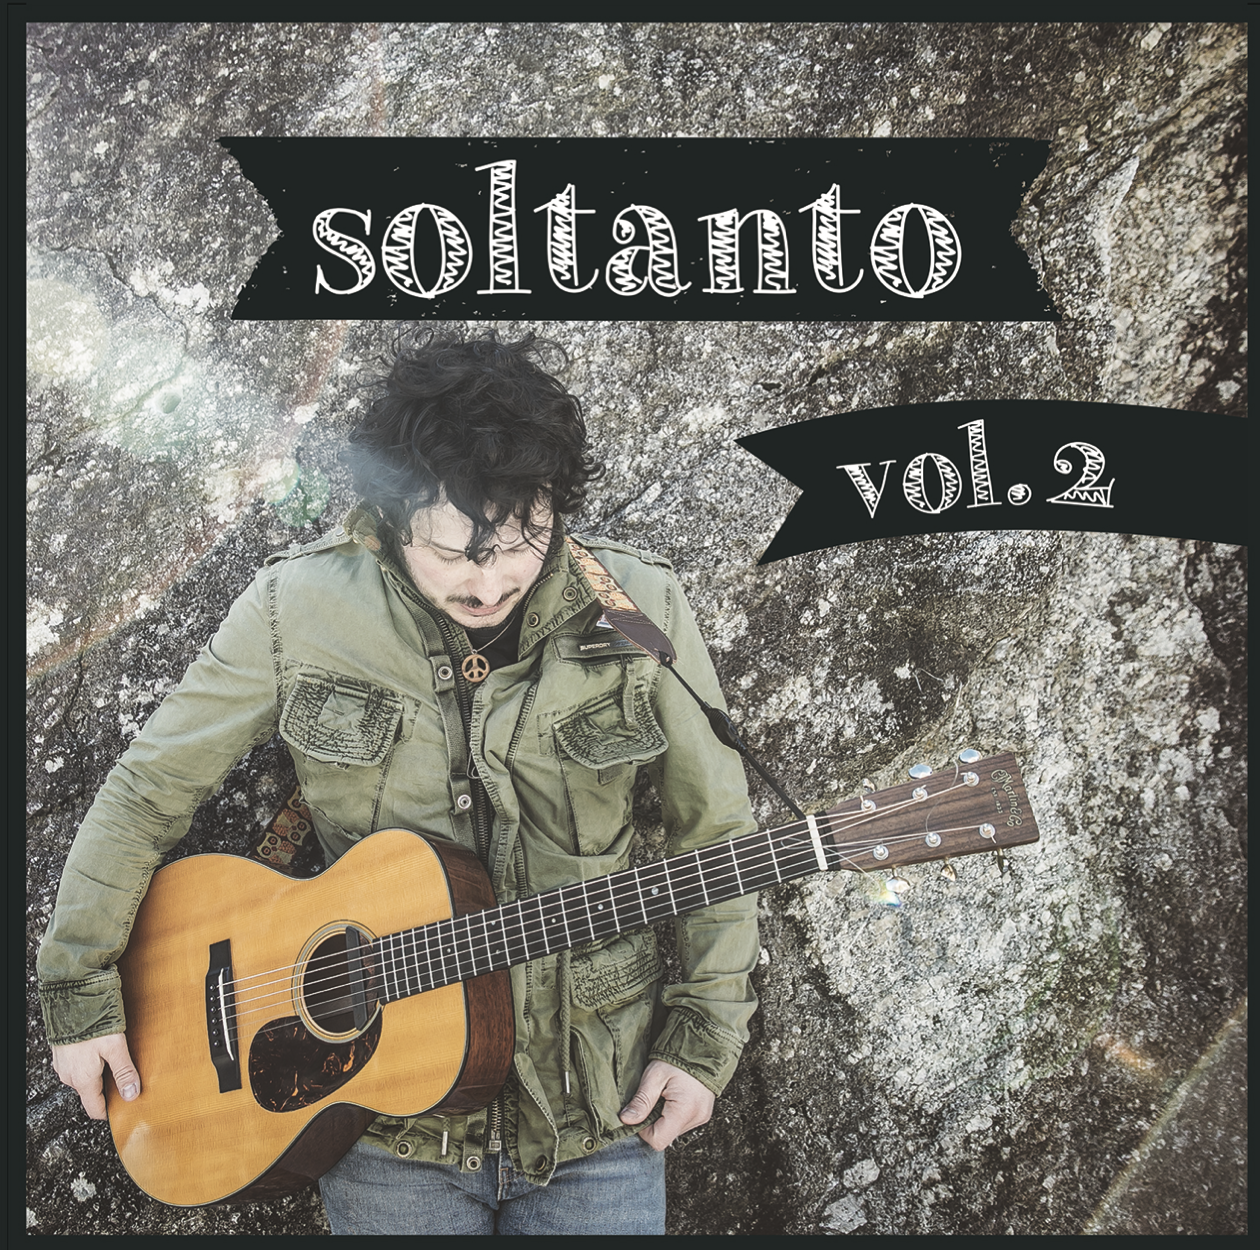 CD Volume 2 (cover songs) - Physical CD